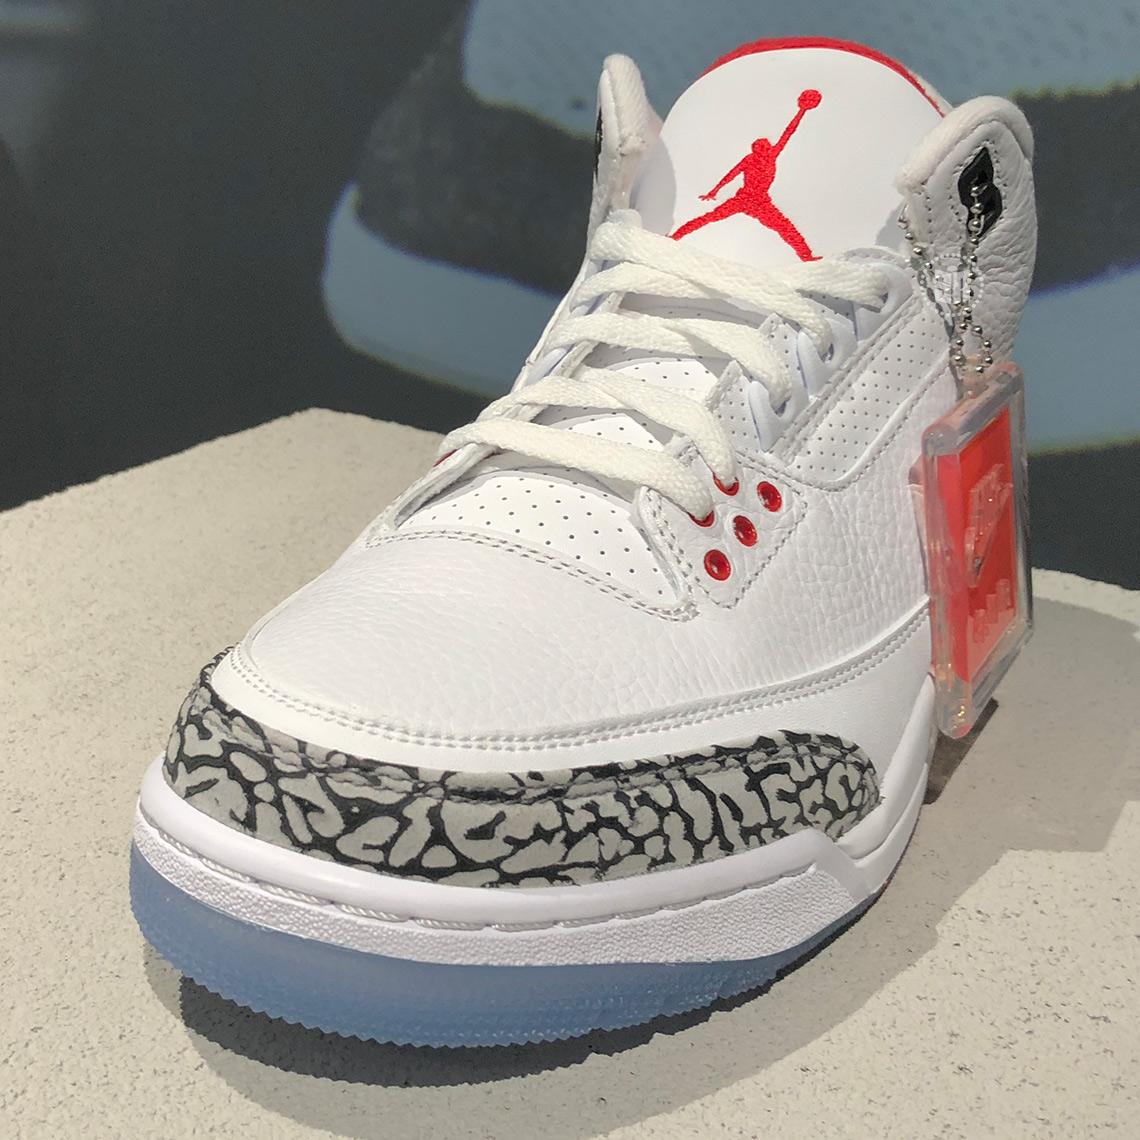 Jordan 1988 All Star Shoes